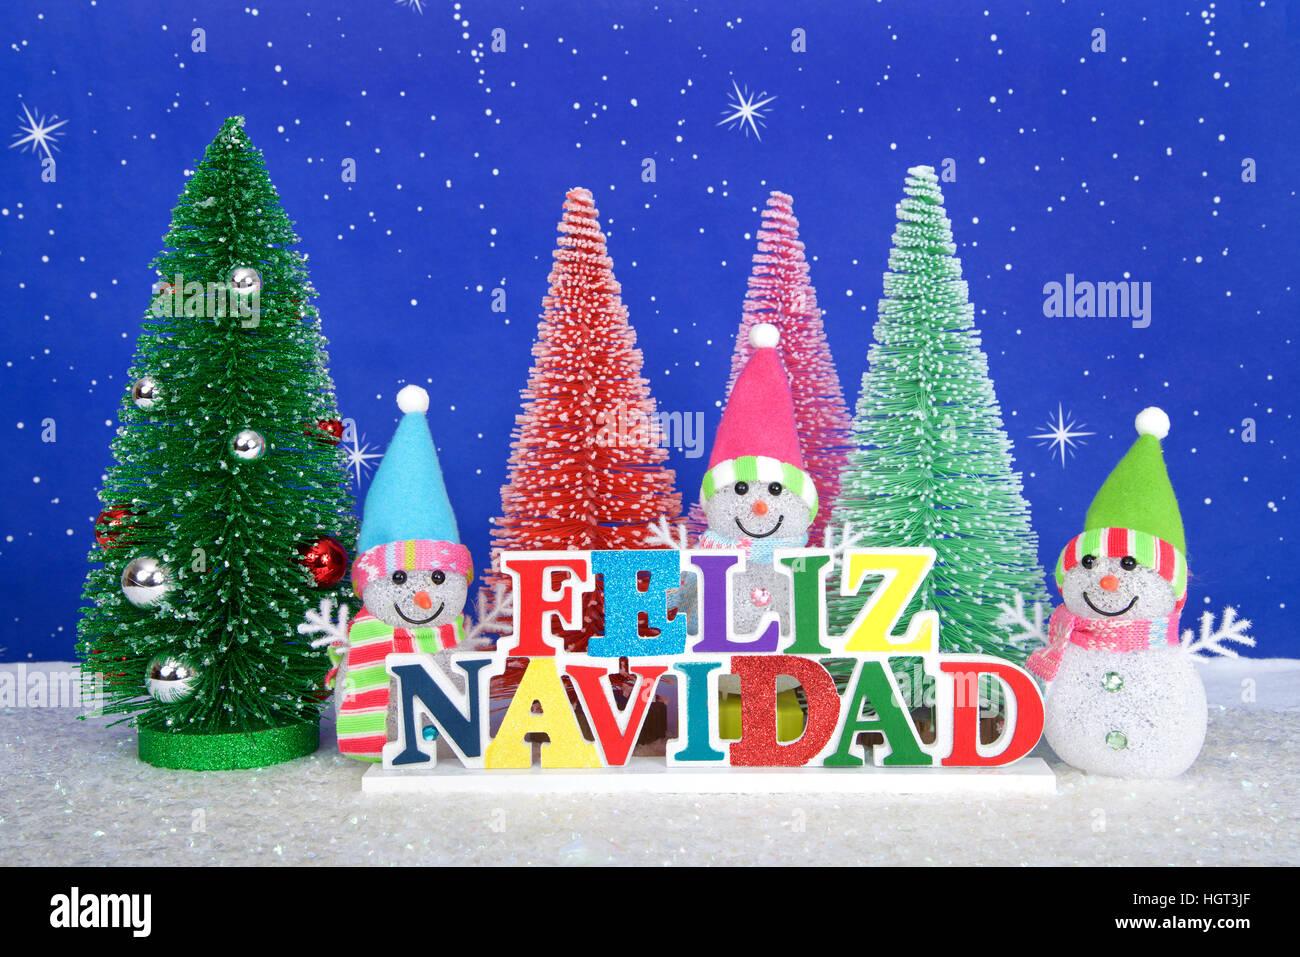 Merry Christmas In Spanish Stock Photos Merry Christmas In Spanish